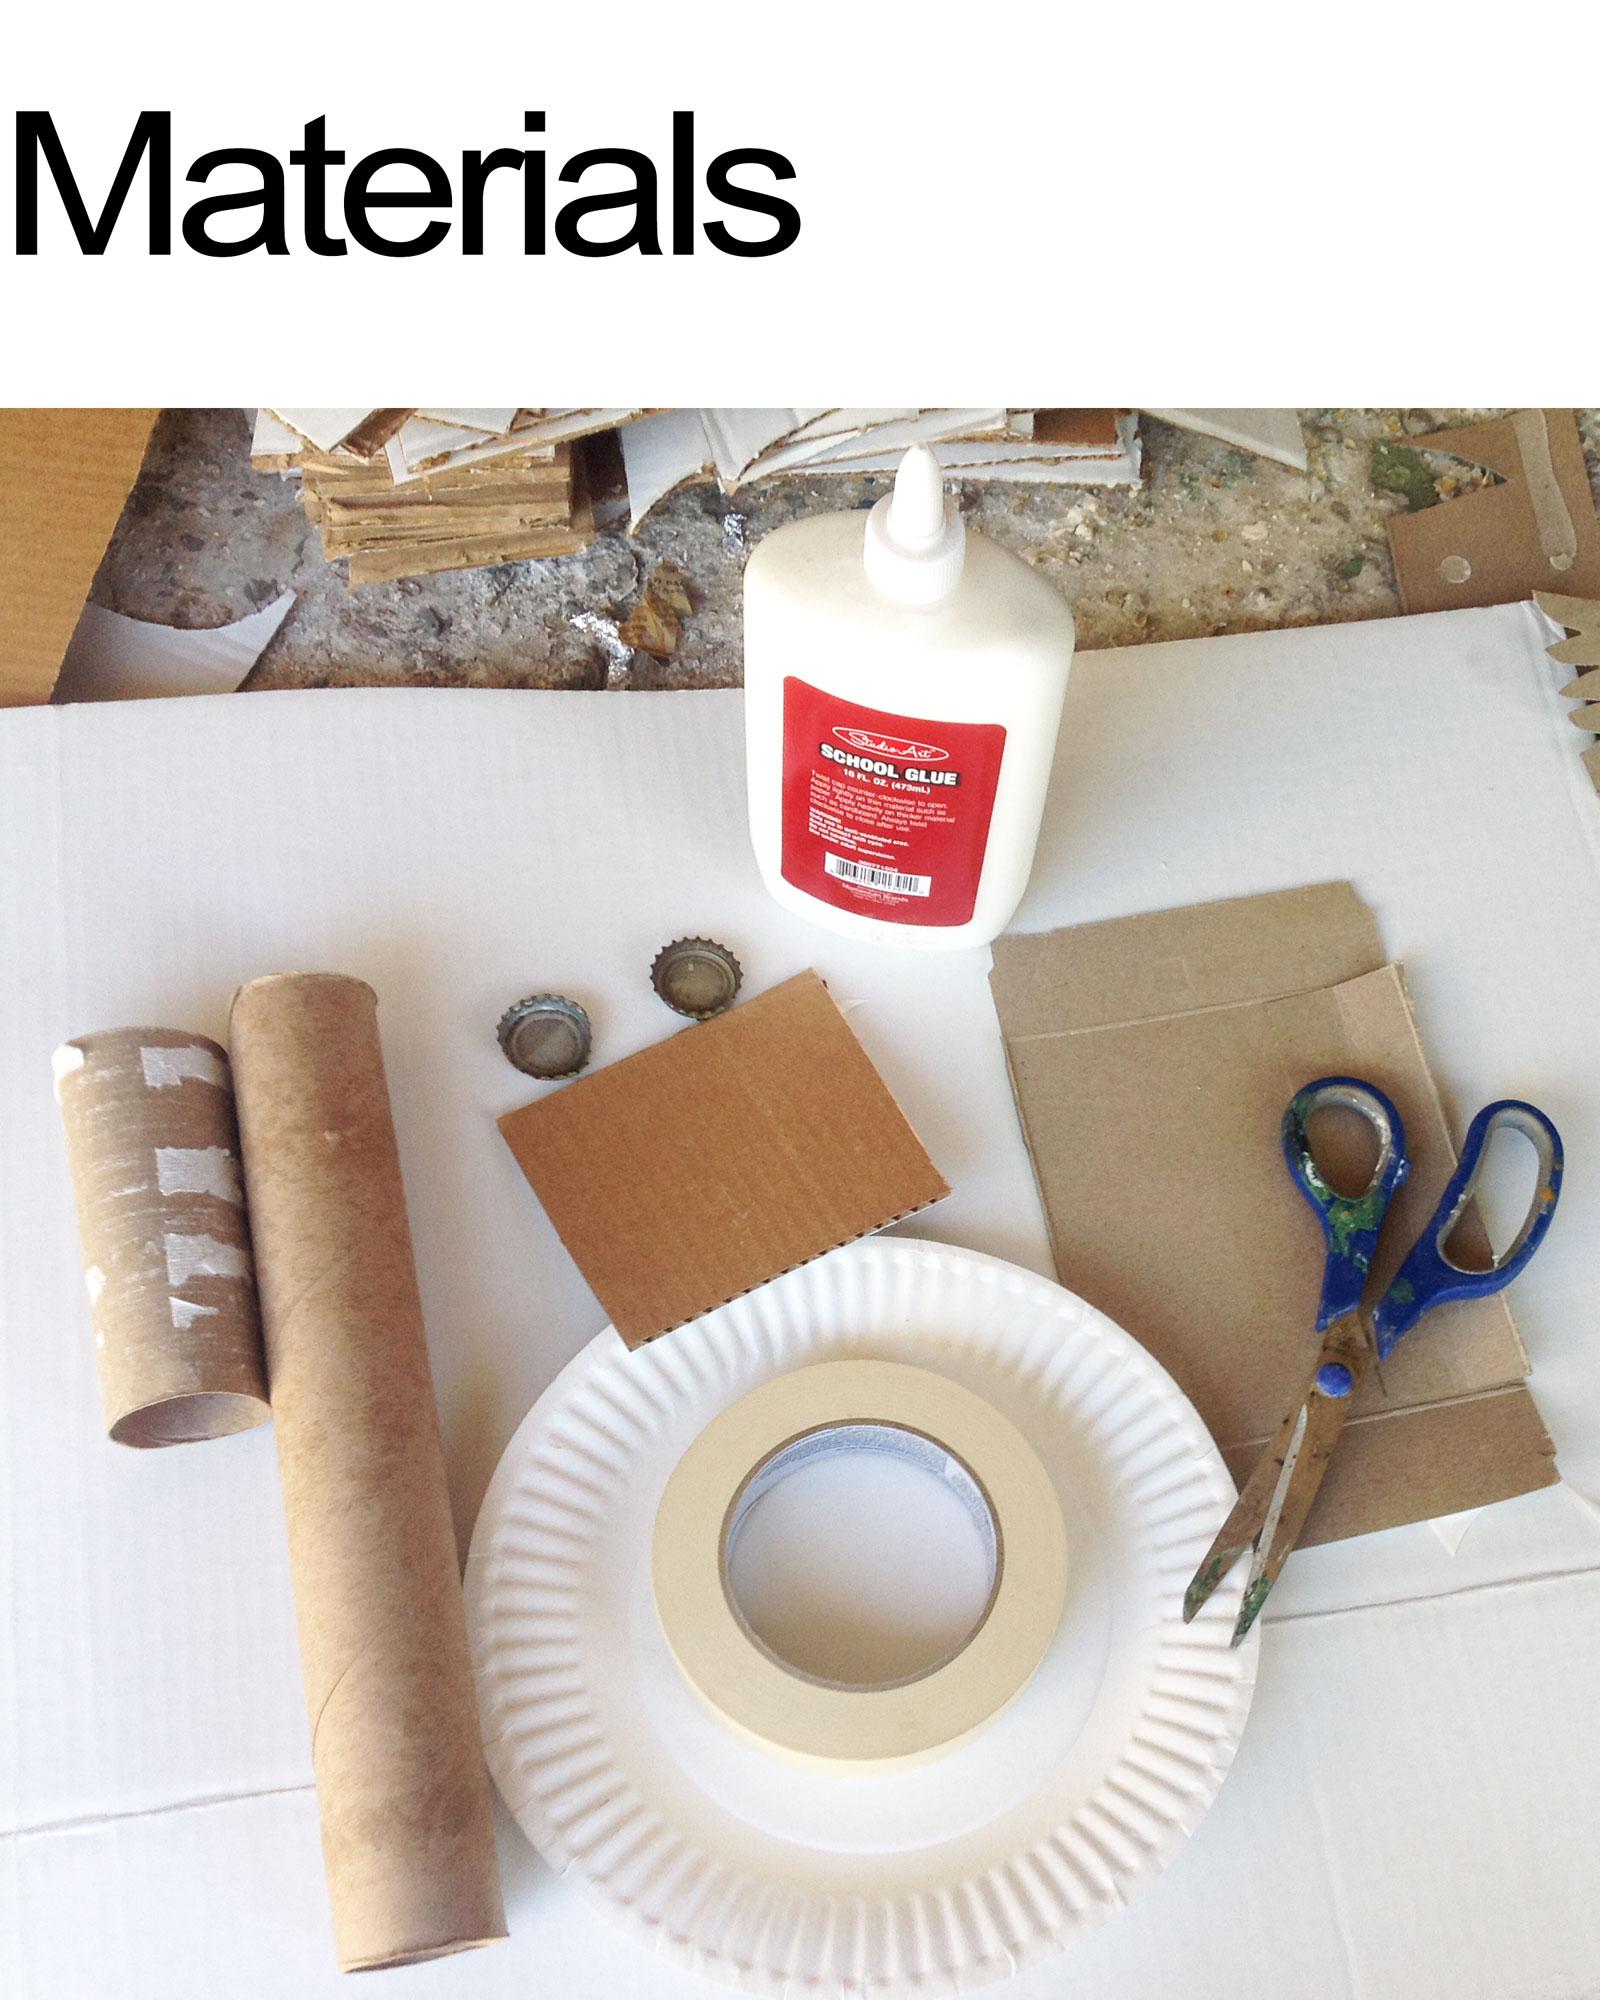 materialsFlat